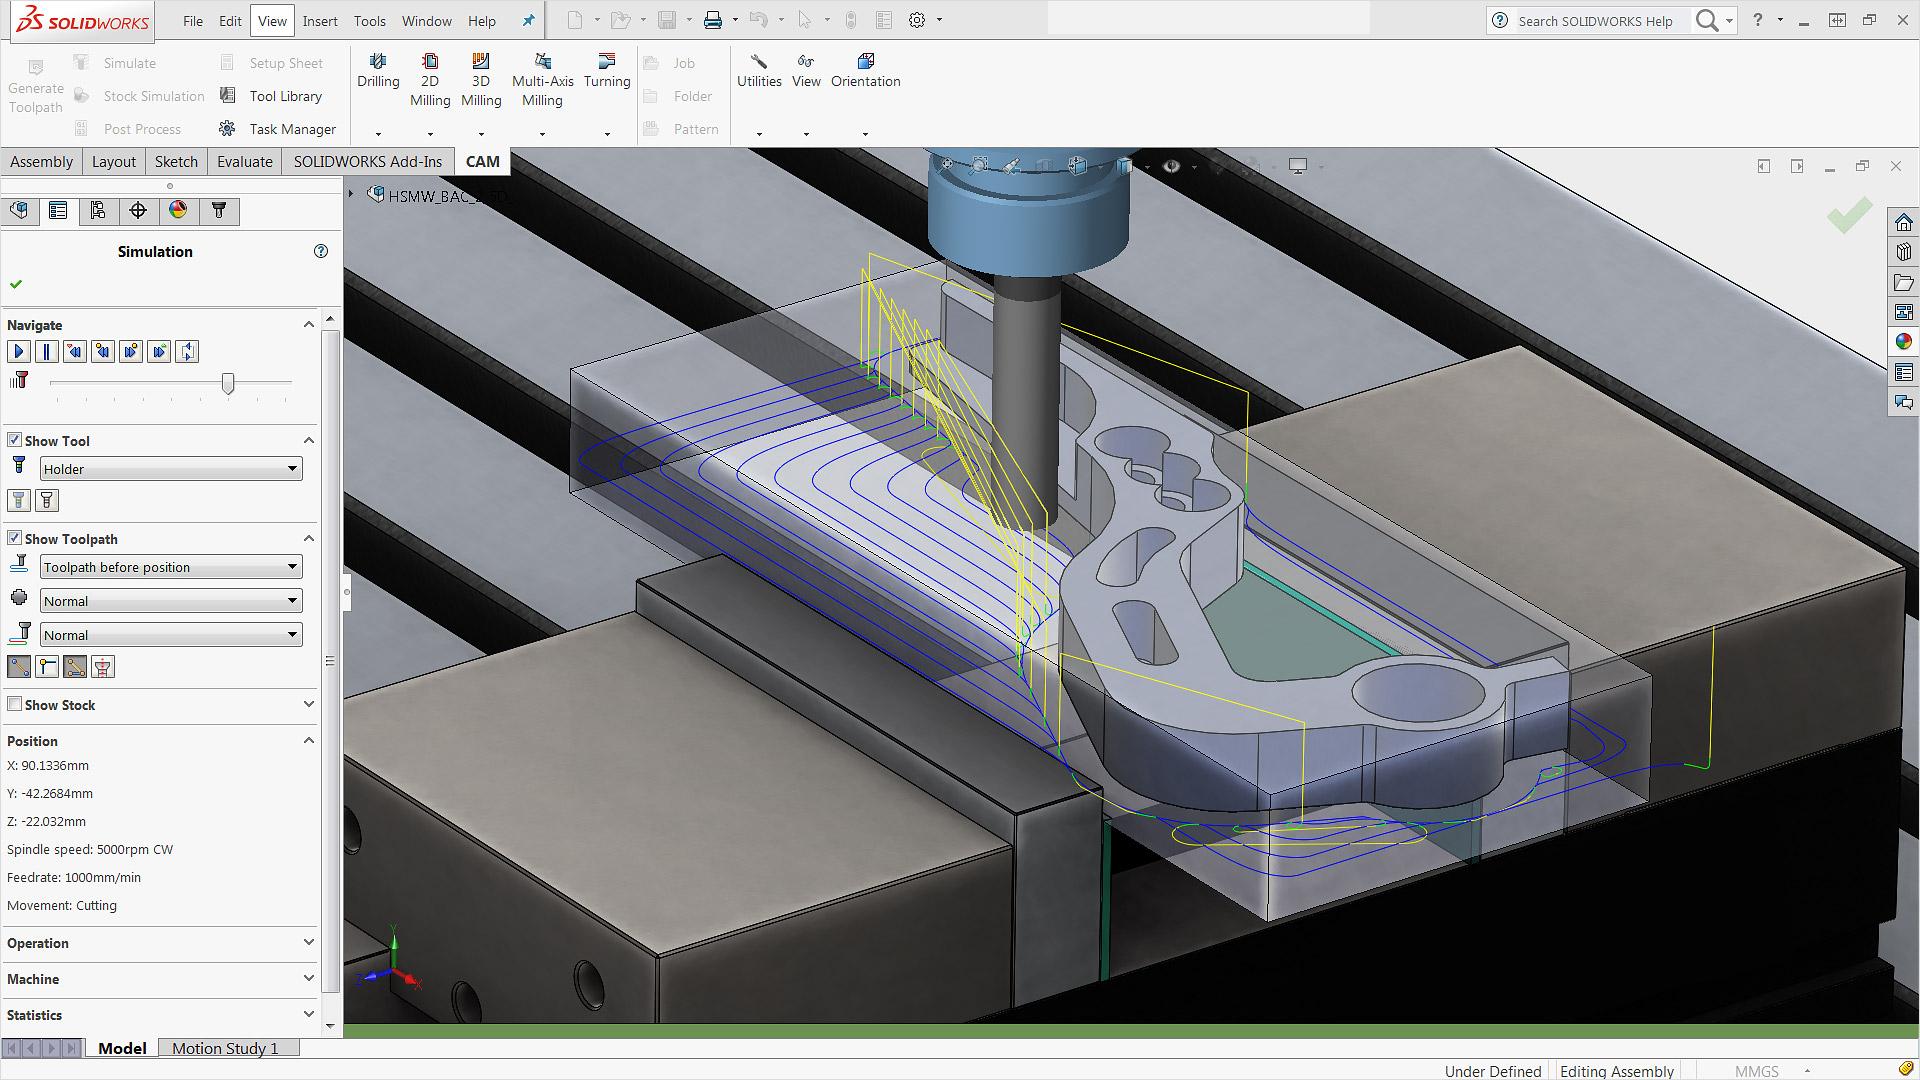 HSMWorks | CAM Software Embedded Into SOLIDWORKS | Autodesk